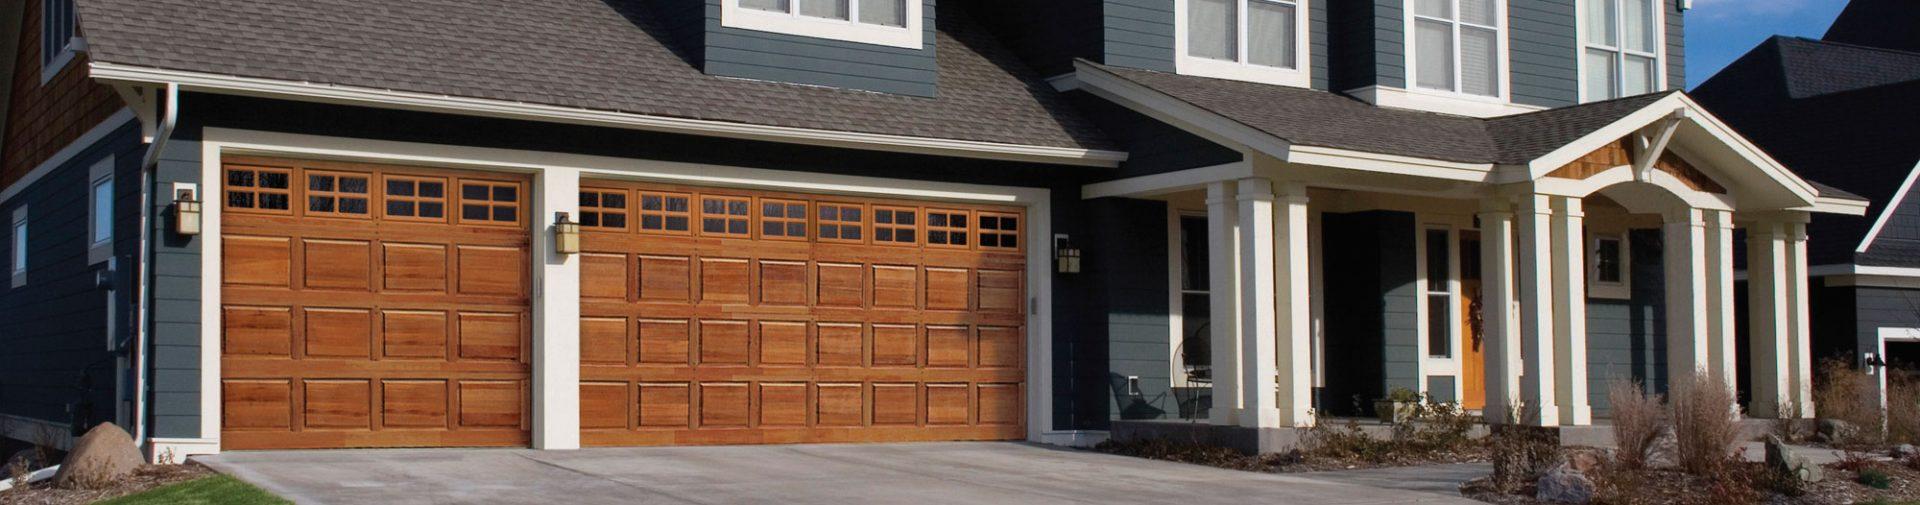 Residential Garage Doors Ae Door Amp Window Cincinnati Oh